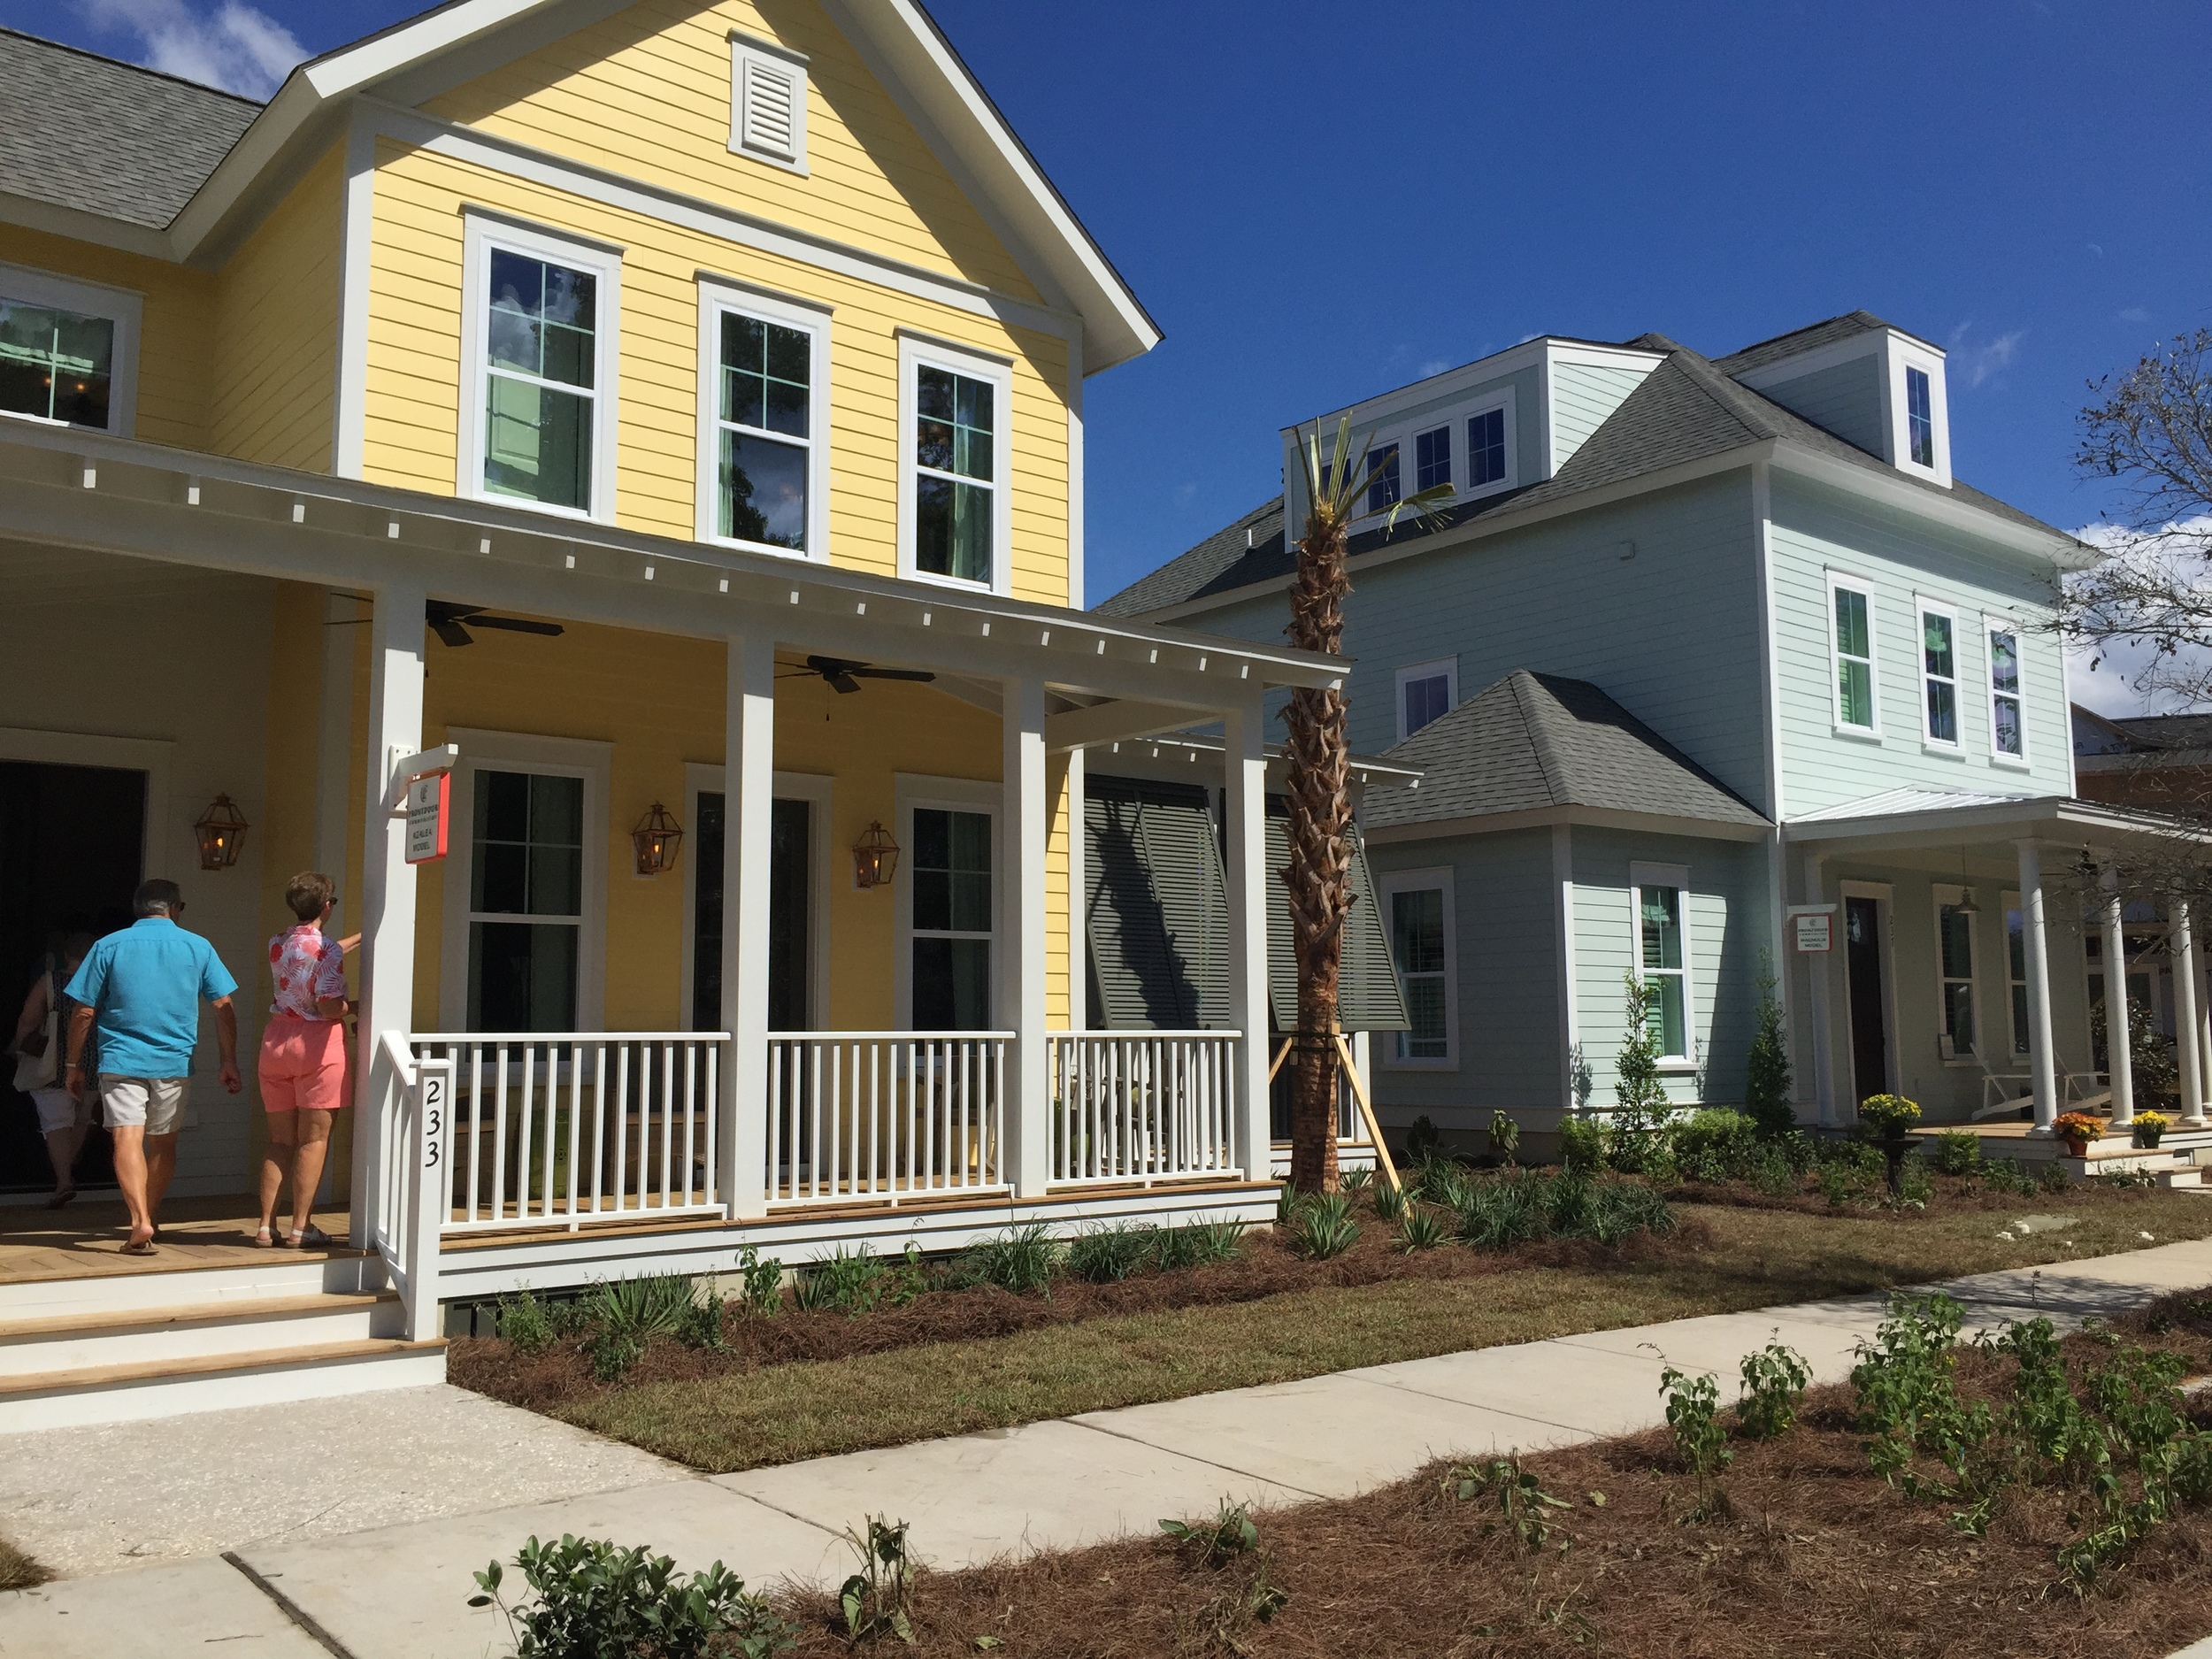 Builder Houses in the Gardenwall Neighborhood